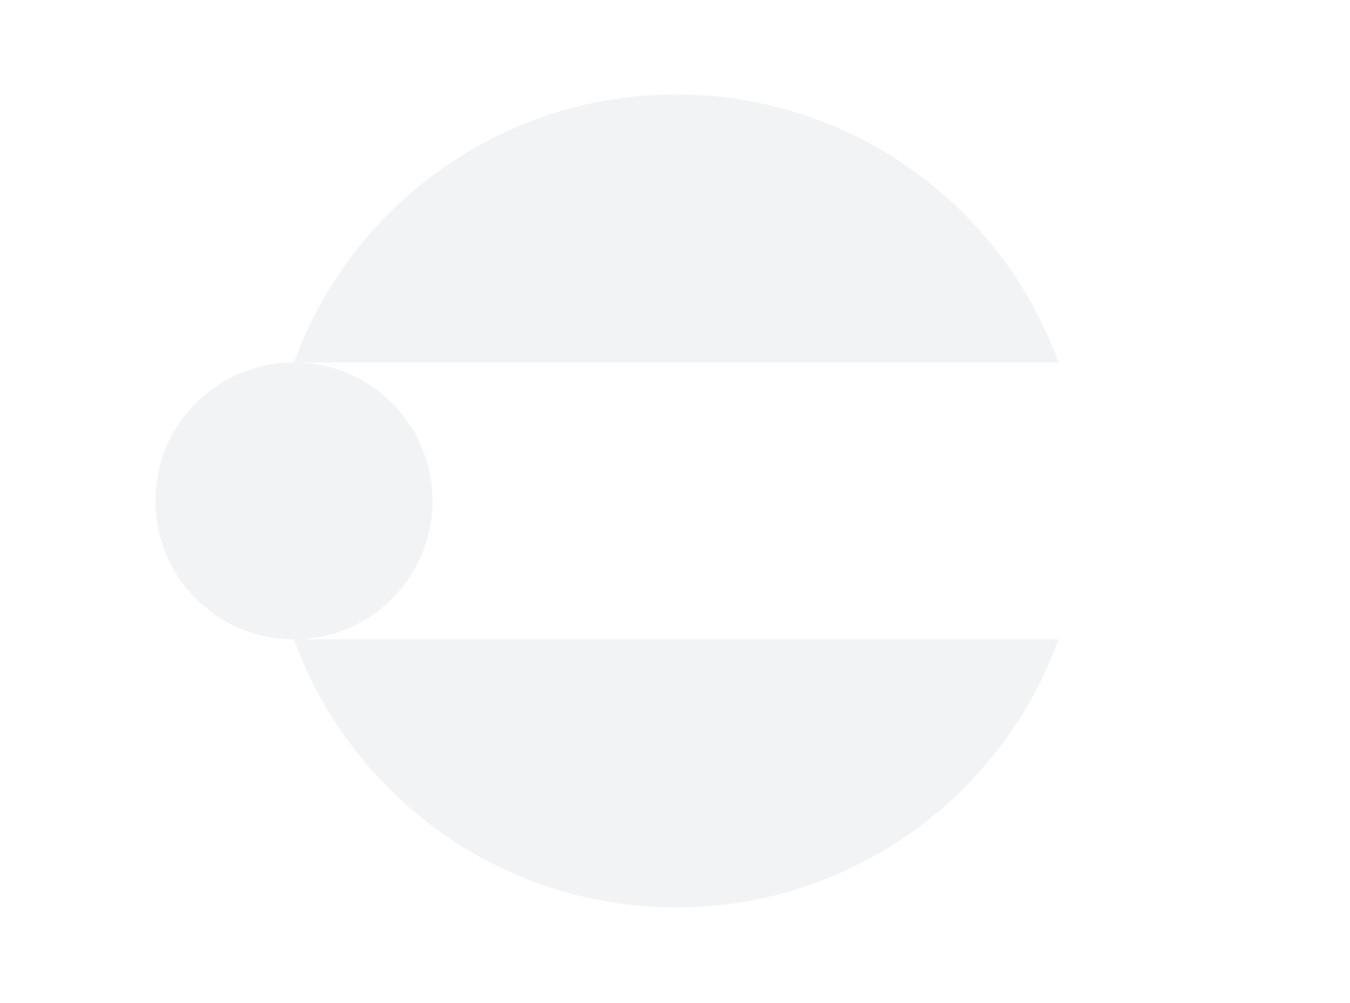 XAOC Devices Logo Shirt (Black) - M